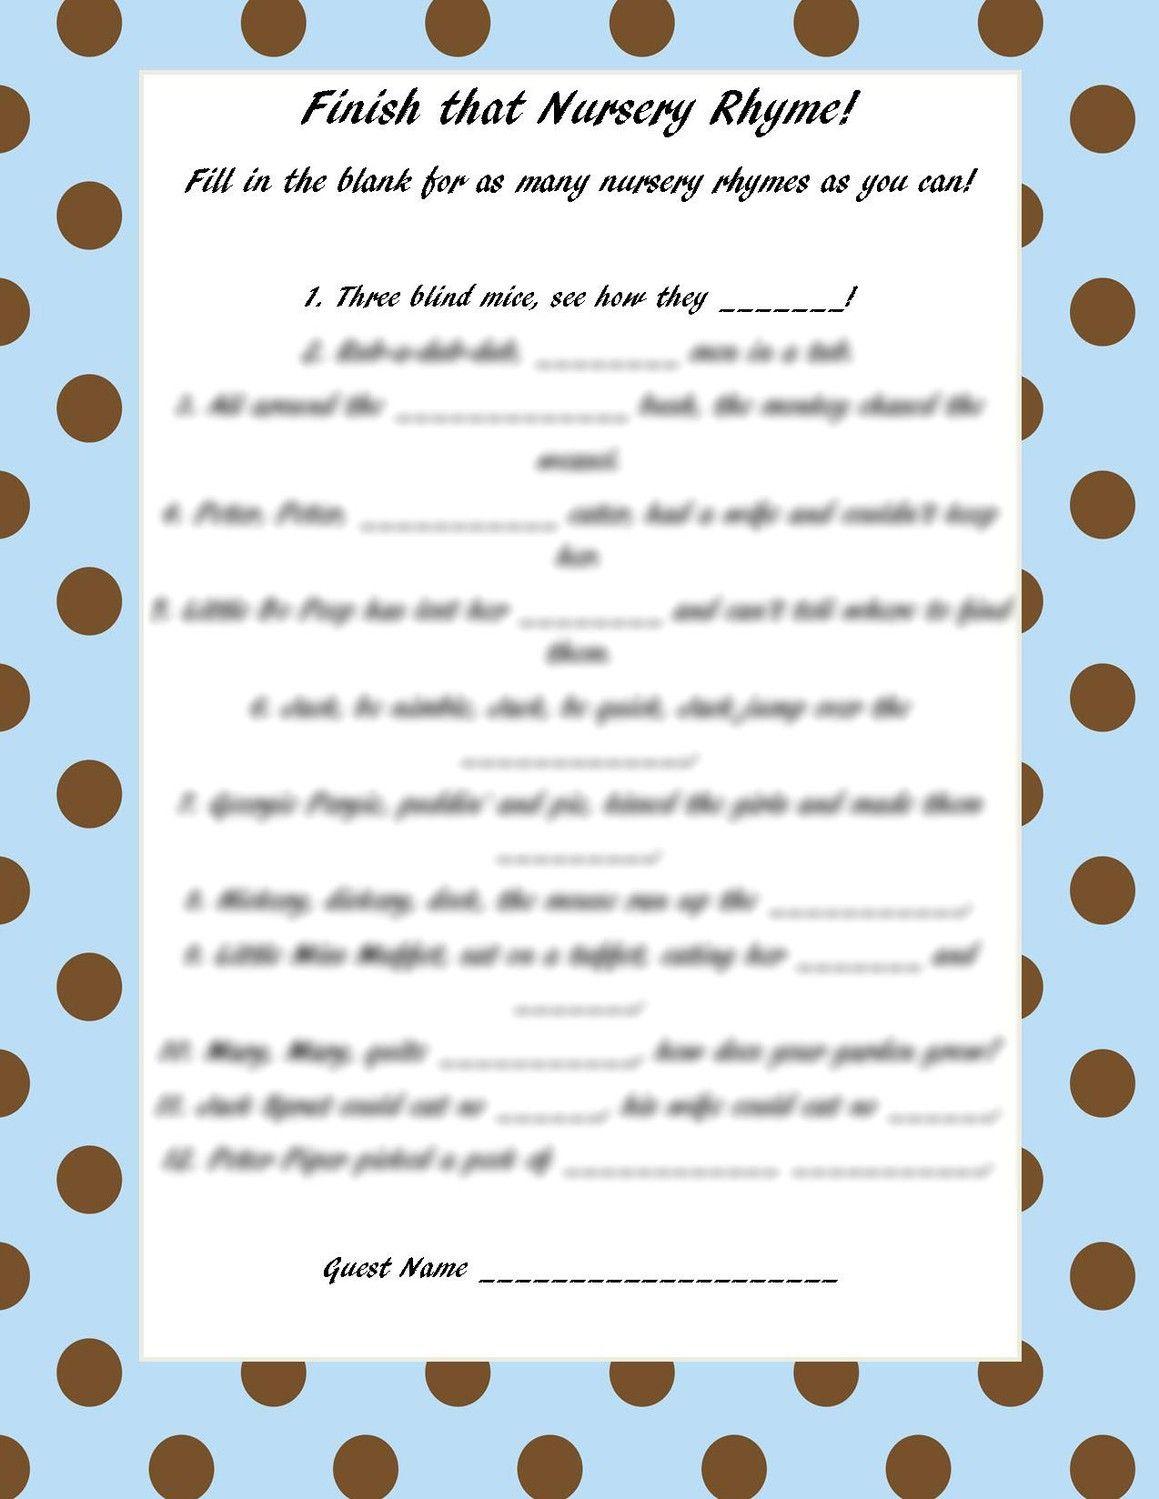 Finish That Nursery Rhyme Pink White Polka By Craftygirlcreationz